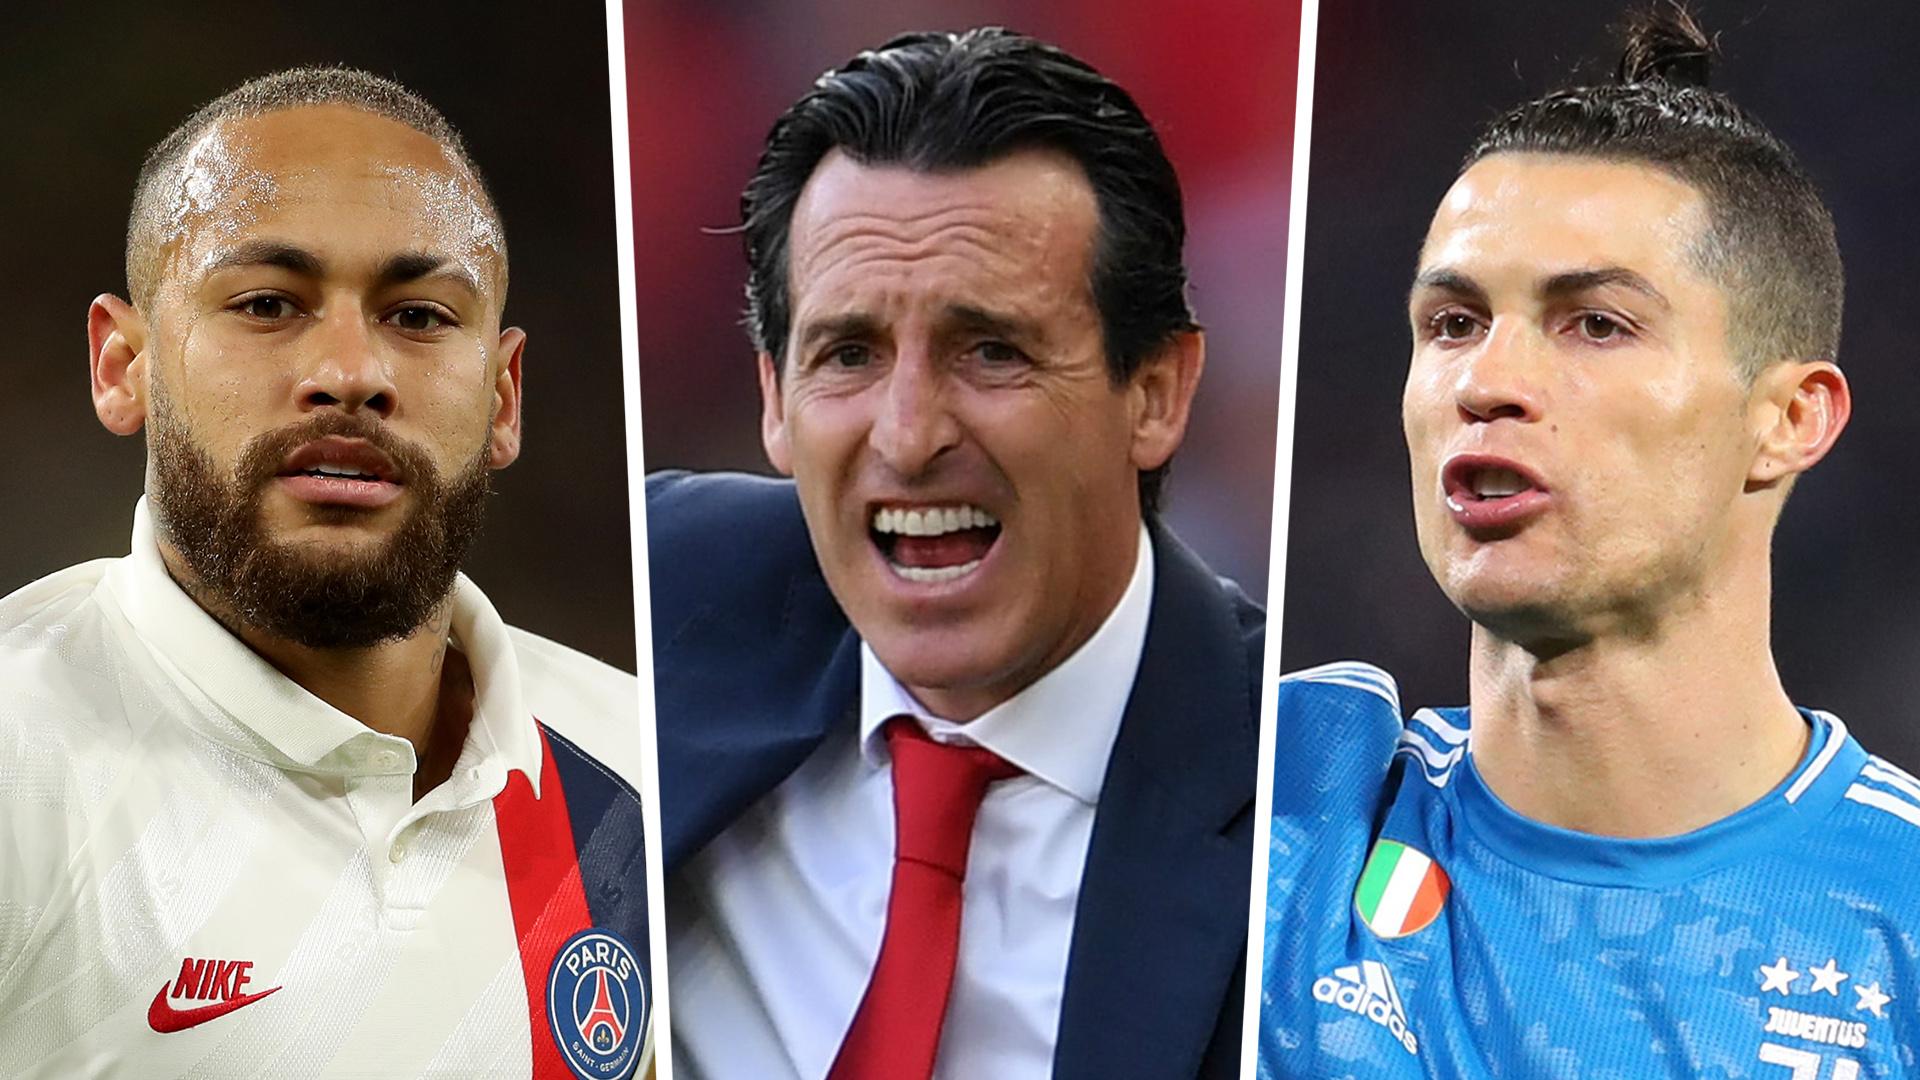 Emery hopes Neymar returns to Spain and wishes Ronaldo had never left